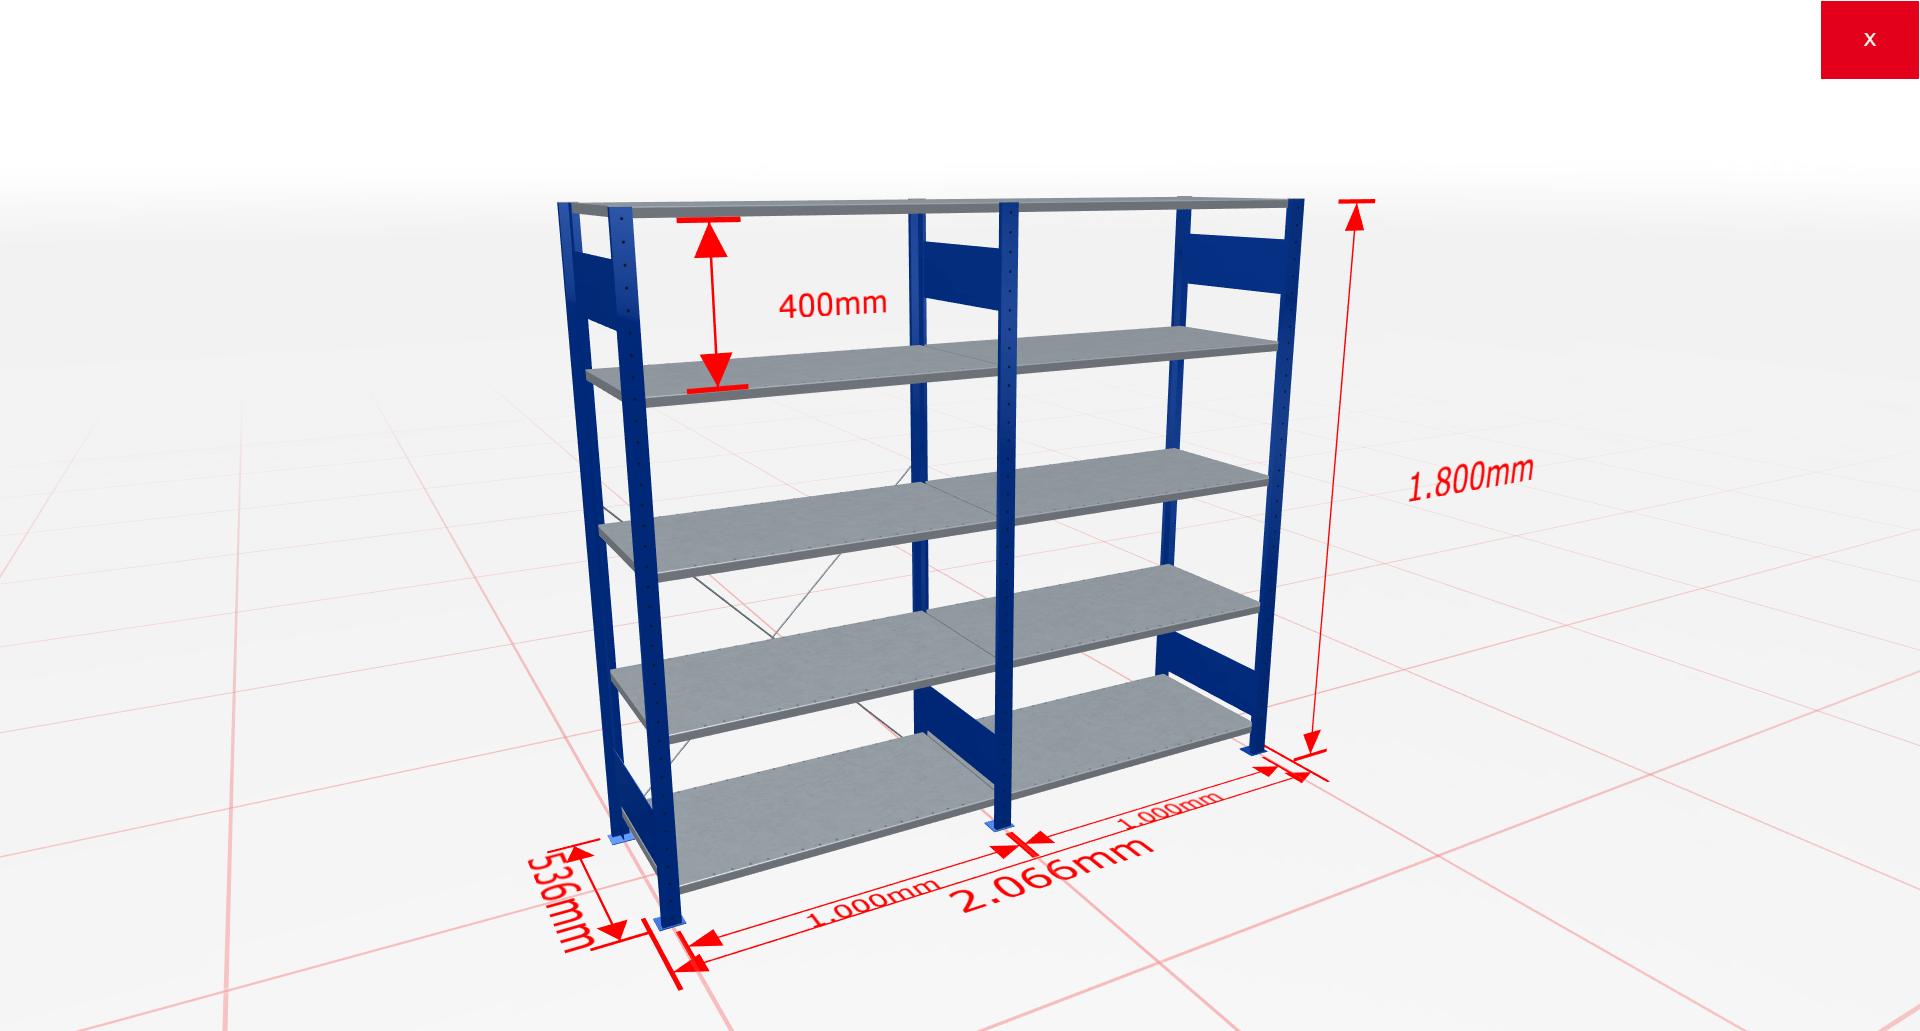 Fachbodenregal Komplettregal 1800x2066x500 mm (HxBxT) SCHULTE Lagertechnik blau 5 Ebenen  150 kg je Boden